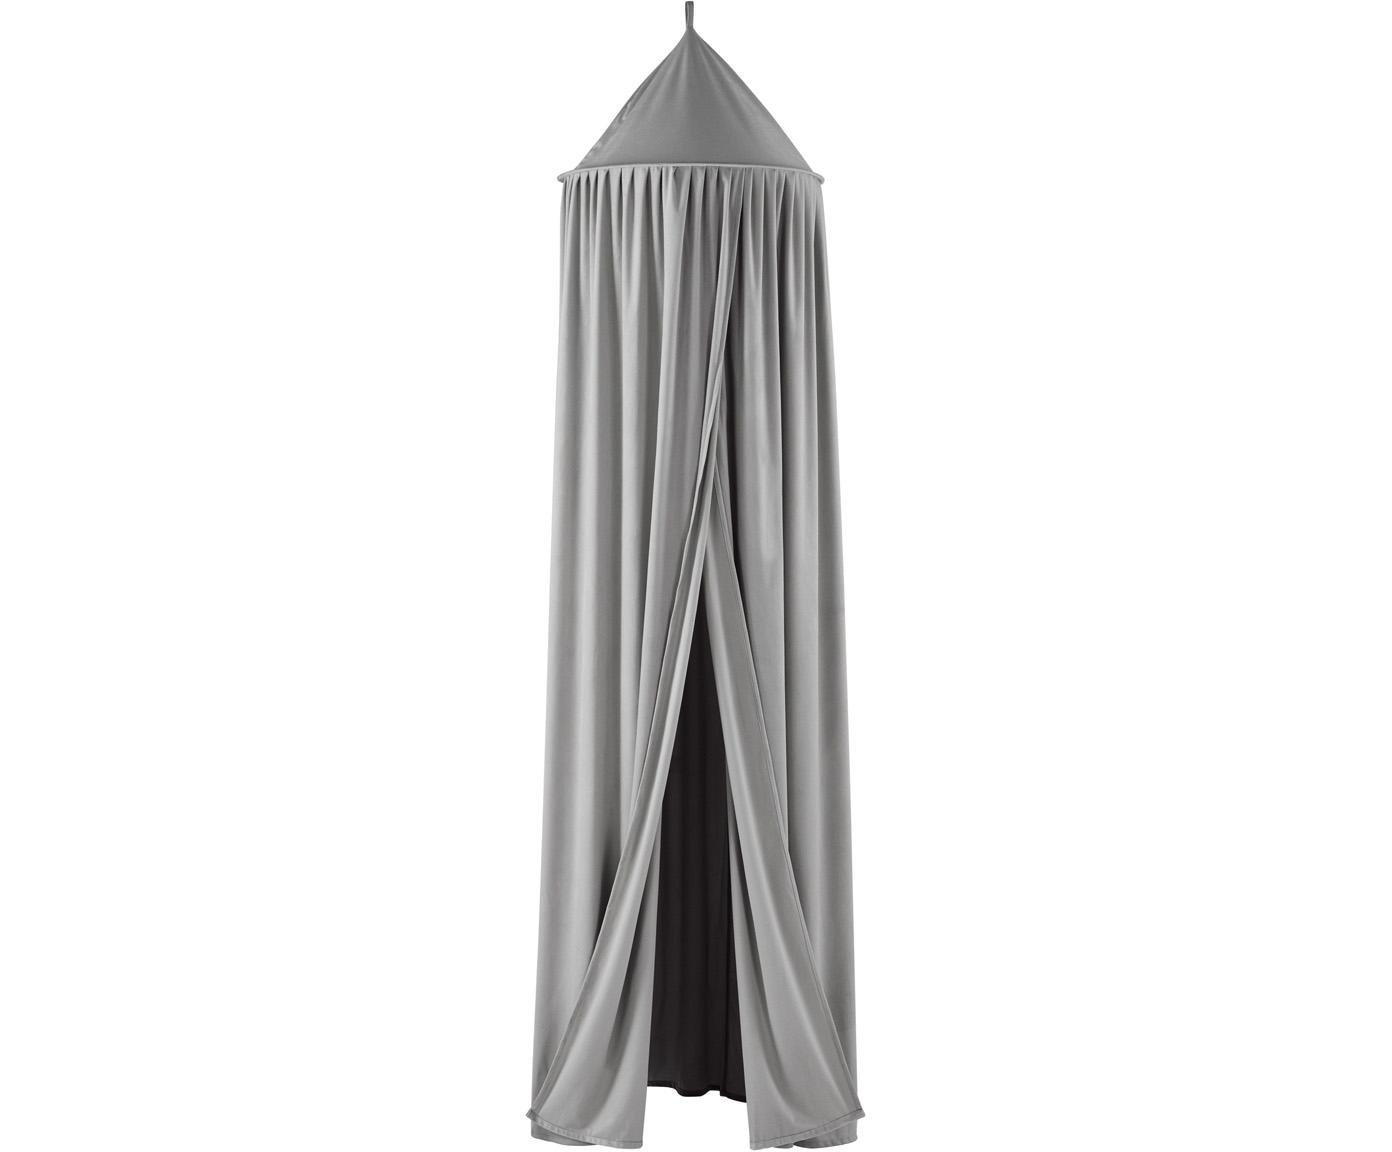 Klamboe Savannah, Polyester, Grijs, Ø 55 x H 240 cm